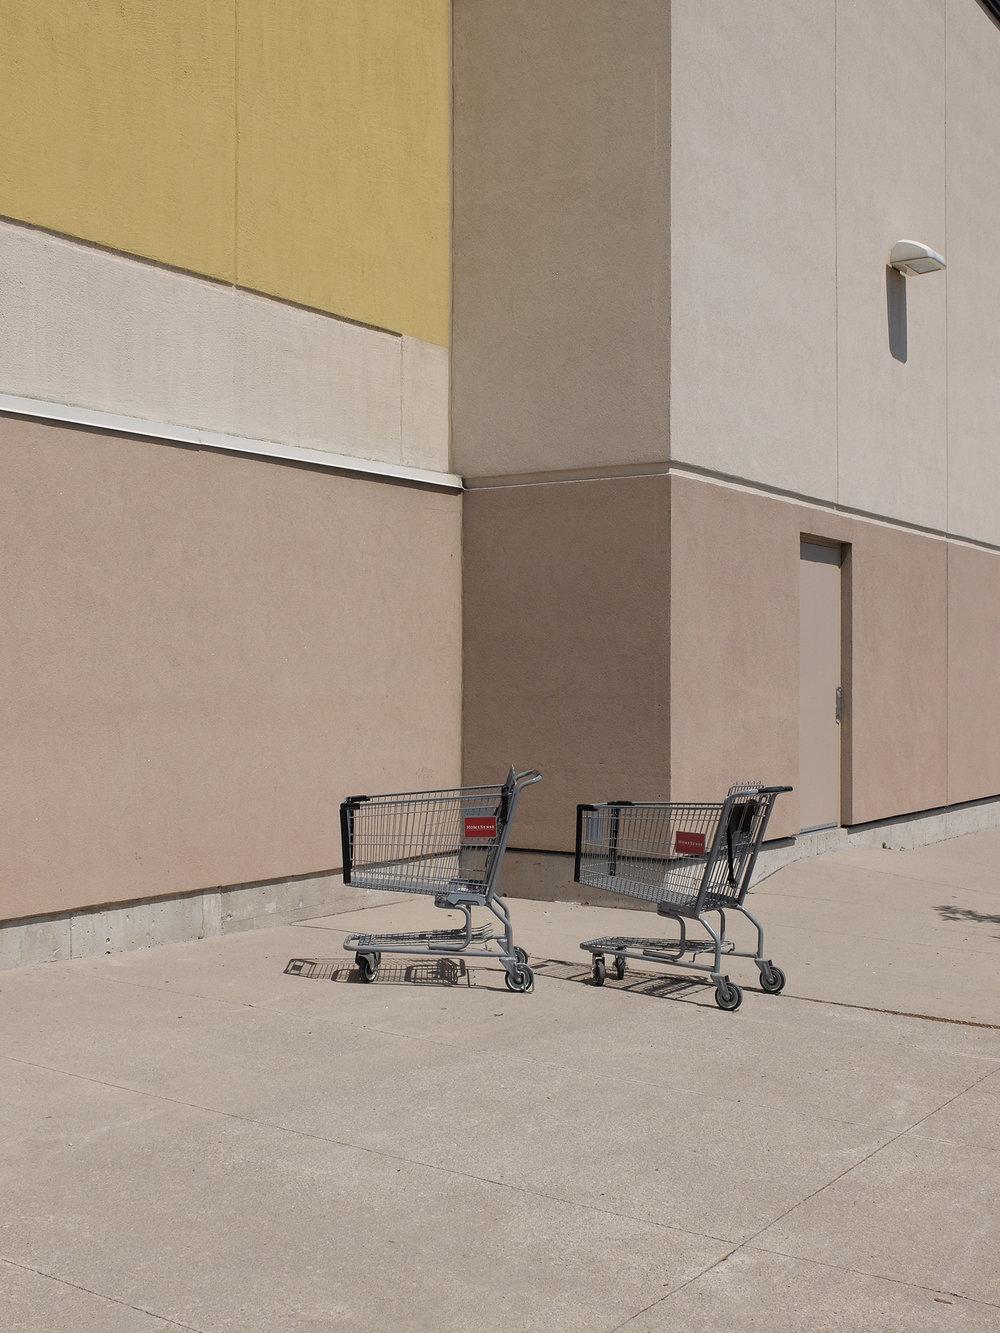 03 - carts2.jpg